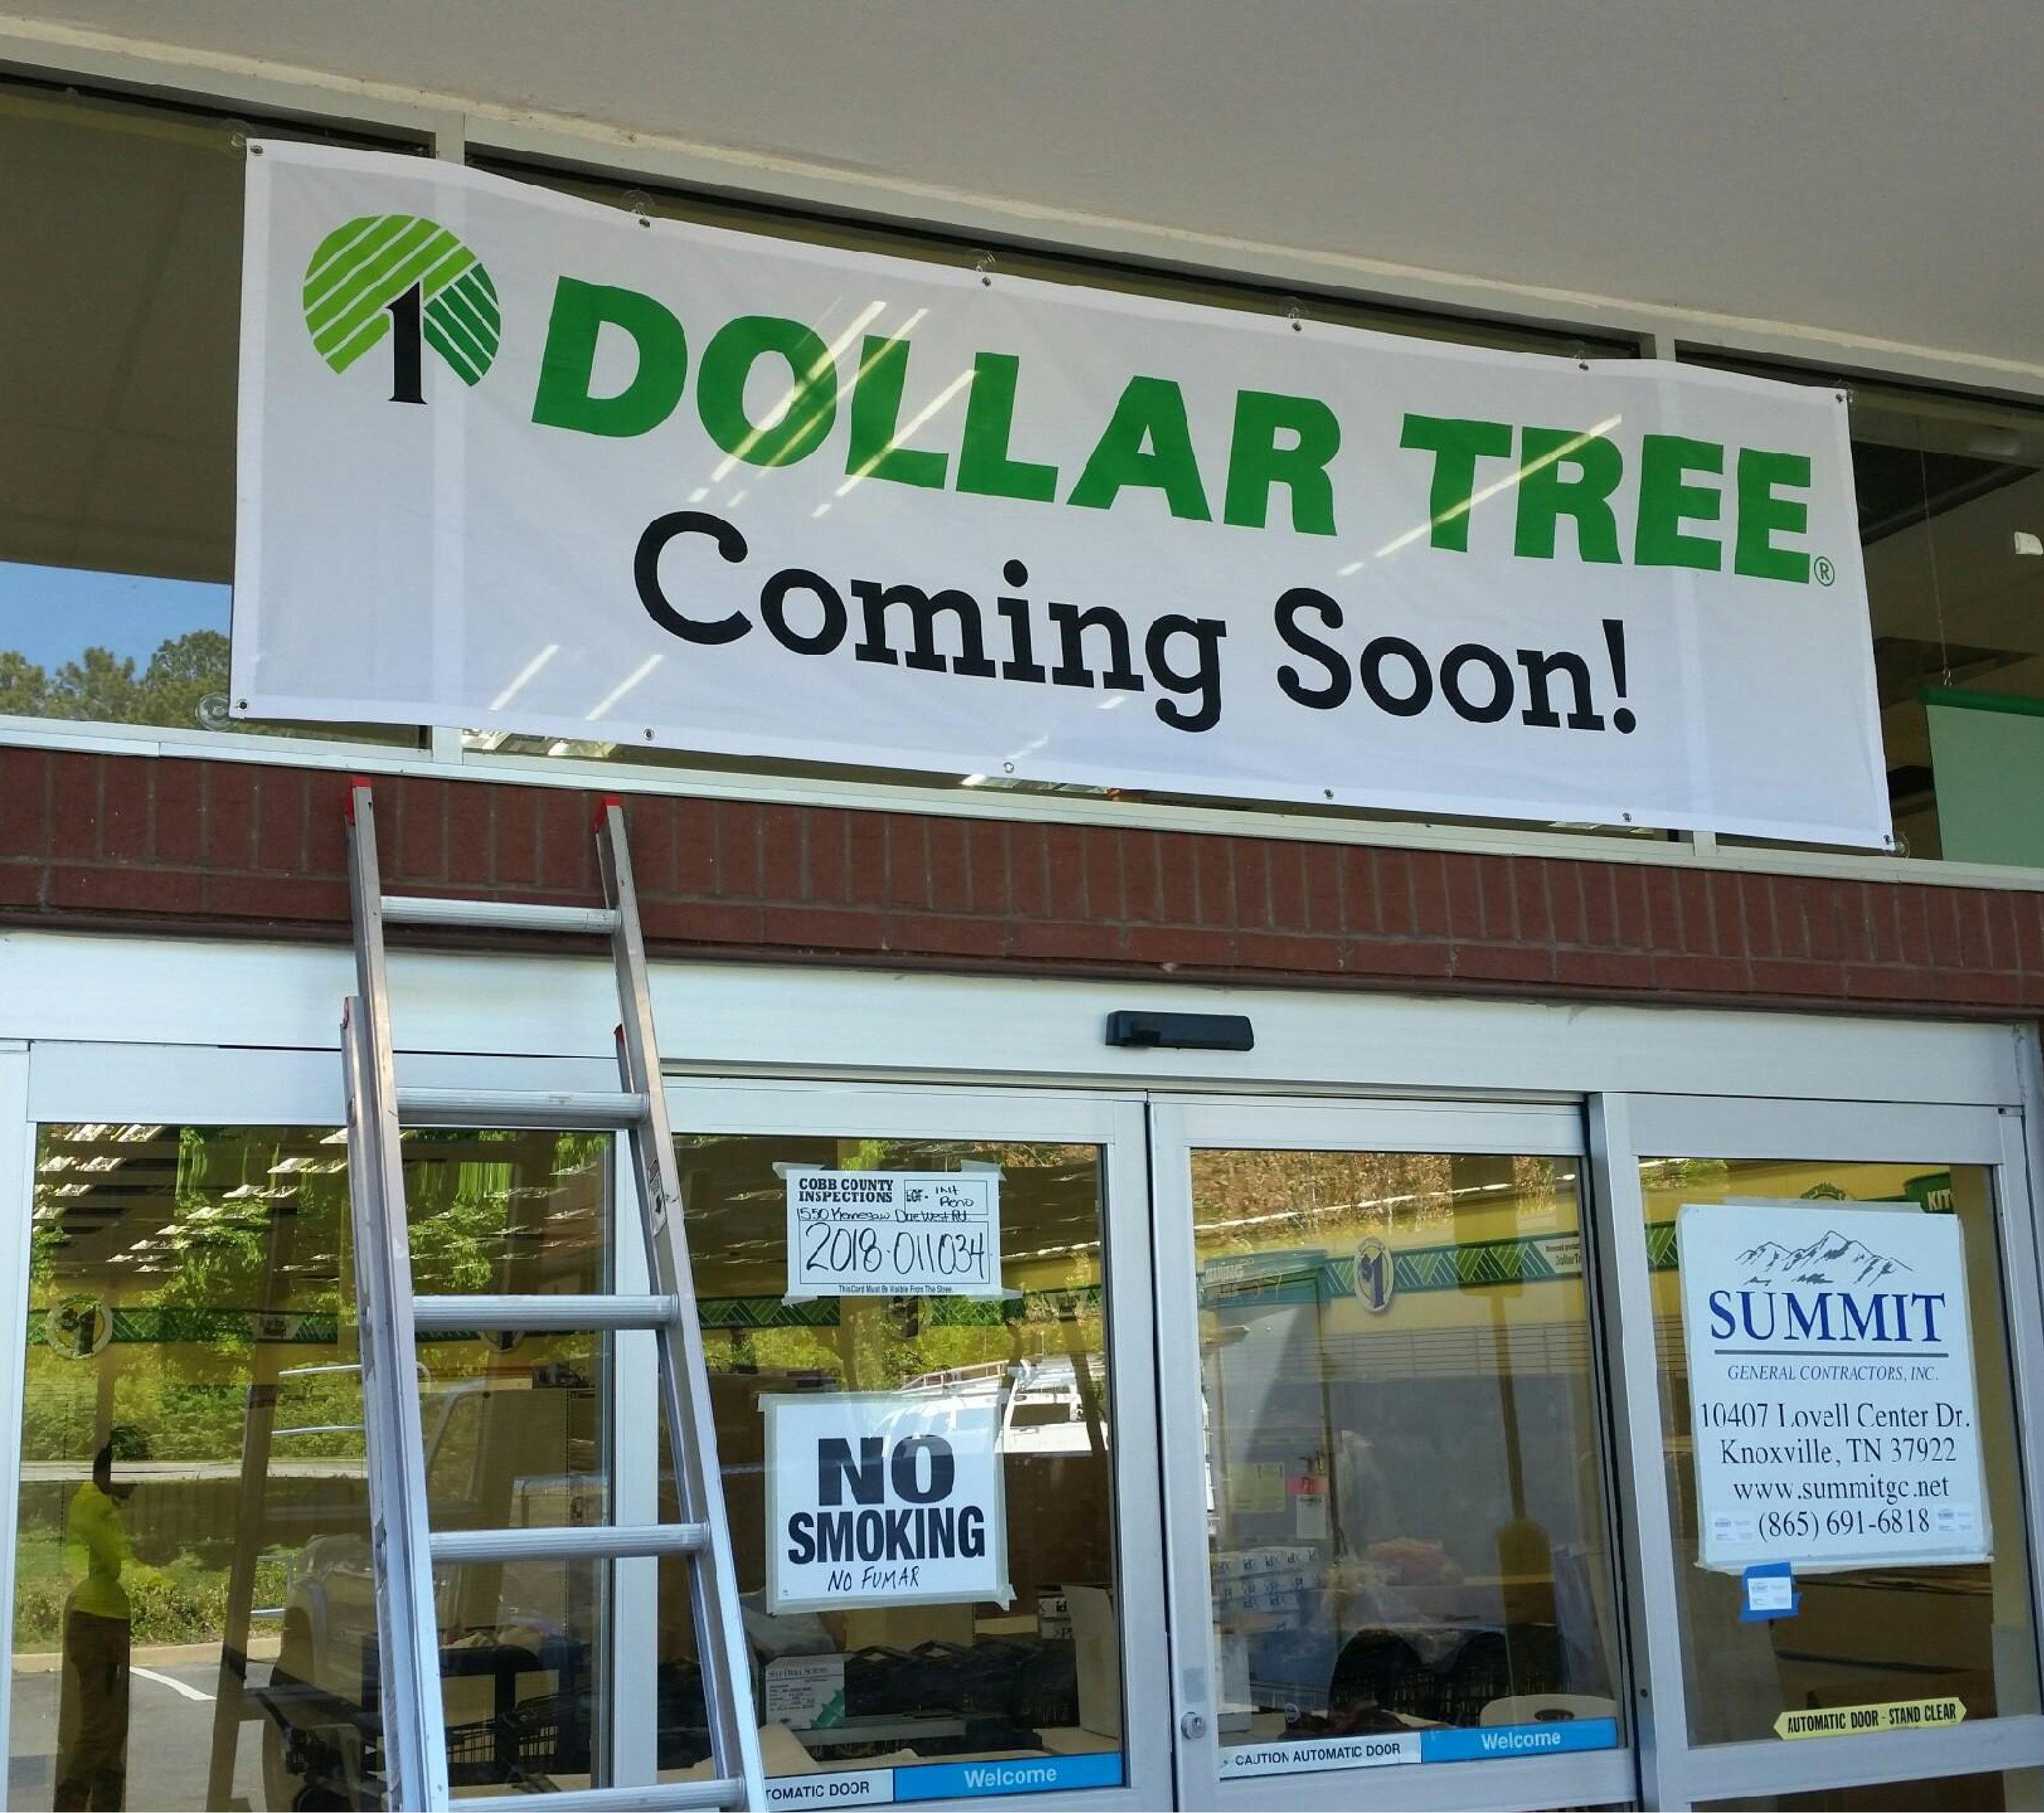 banner 2 - dollar tree.JPG